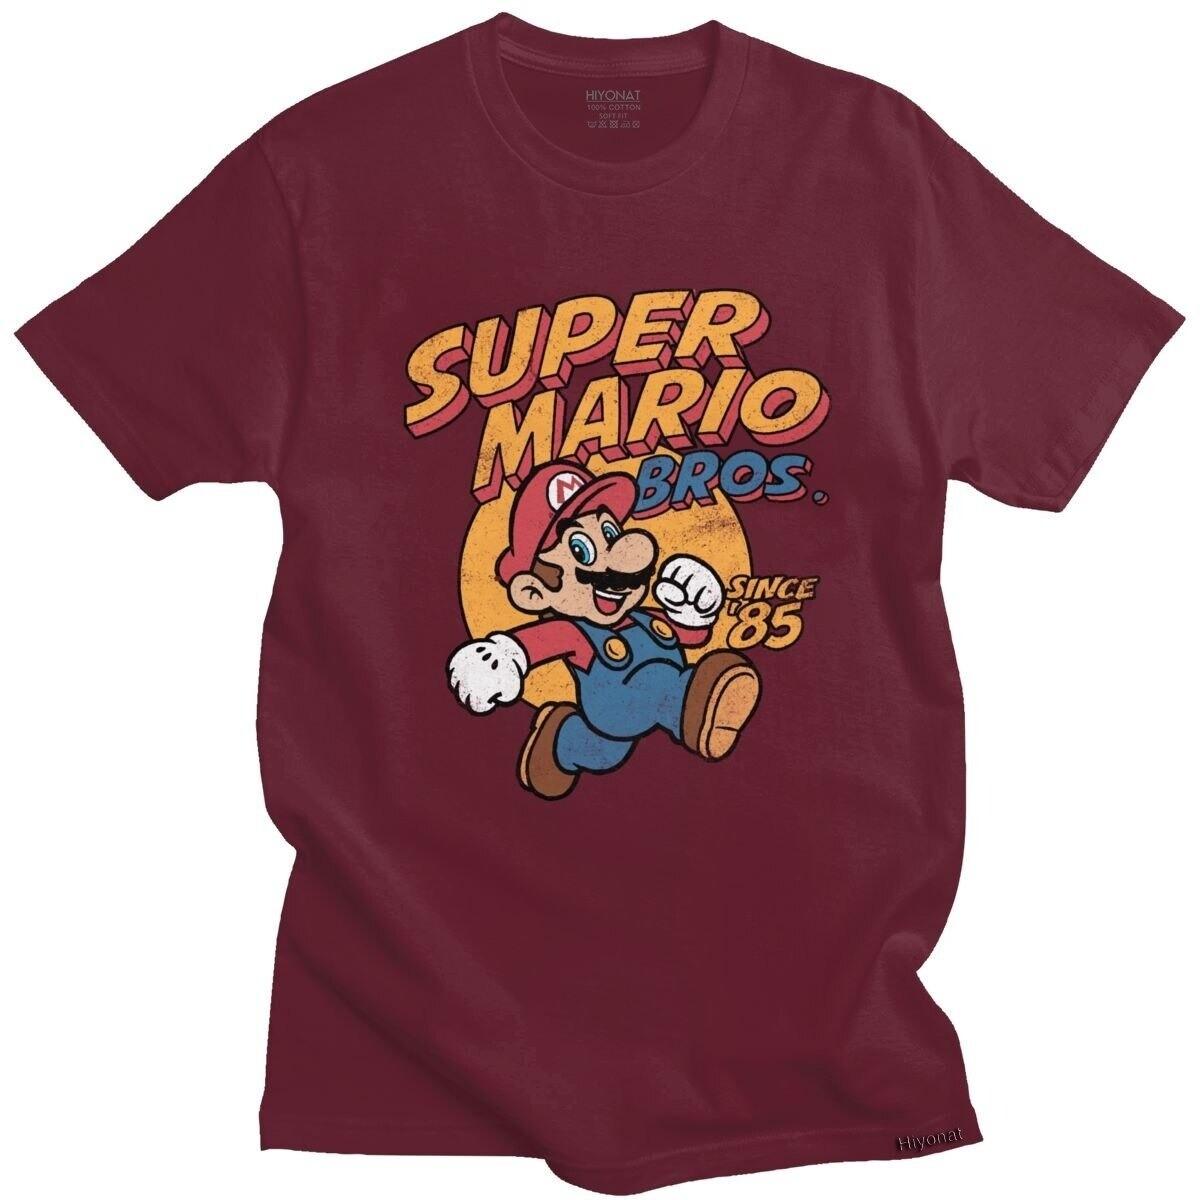 T-shirt Super Mario Bros Retro Nintendo - 7 coloris différents